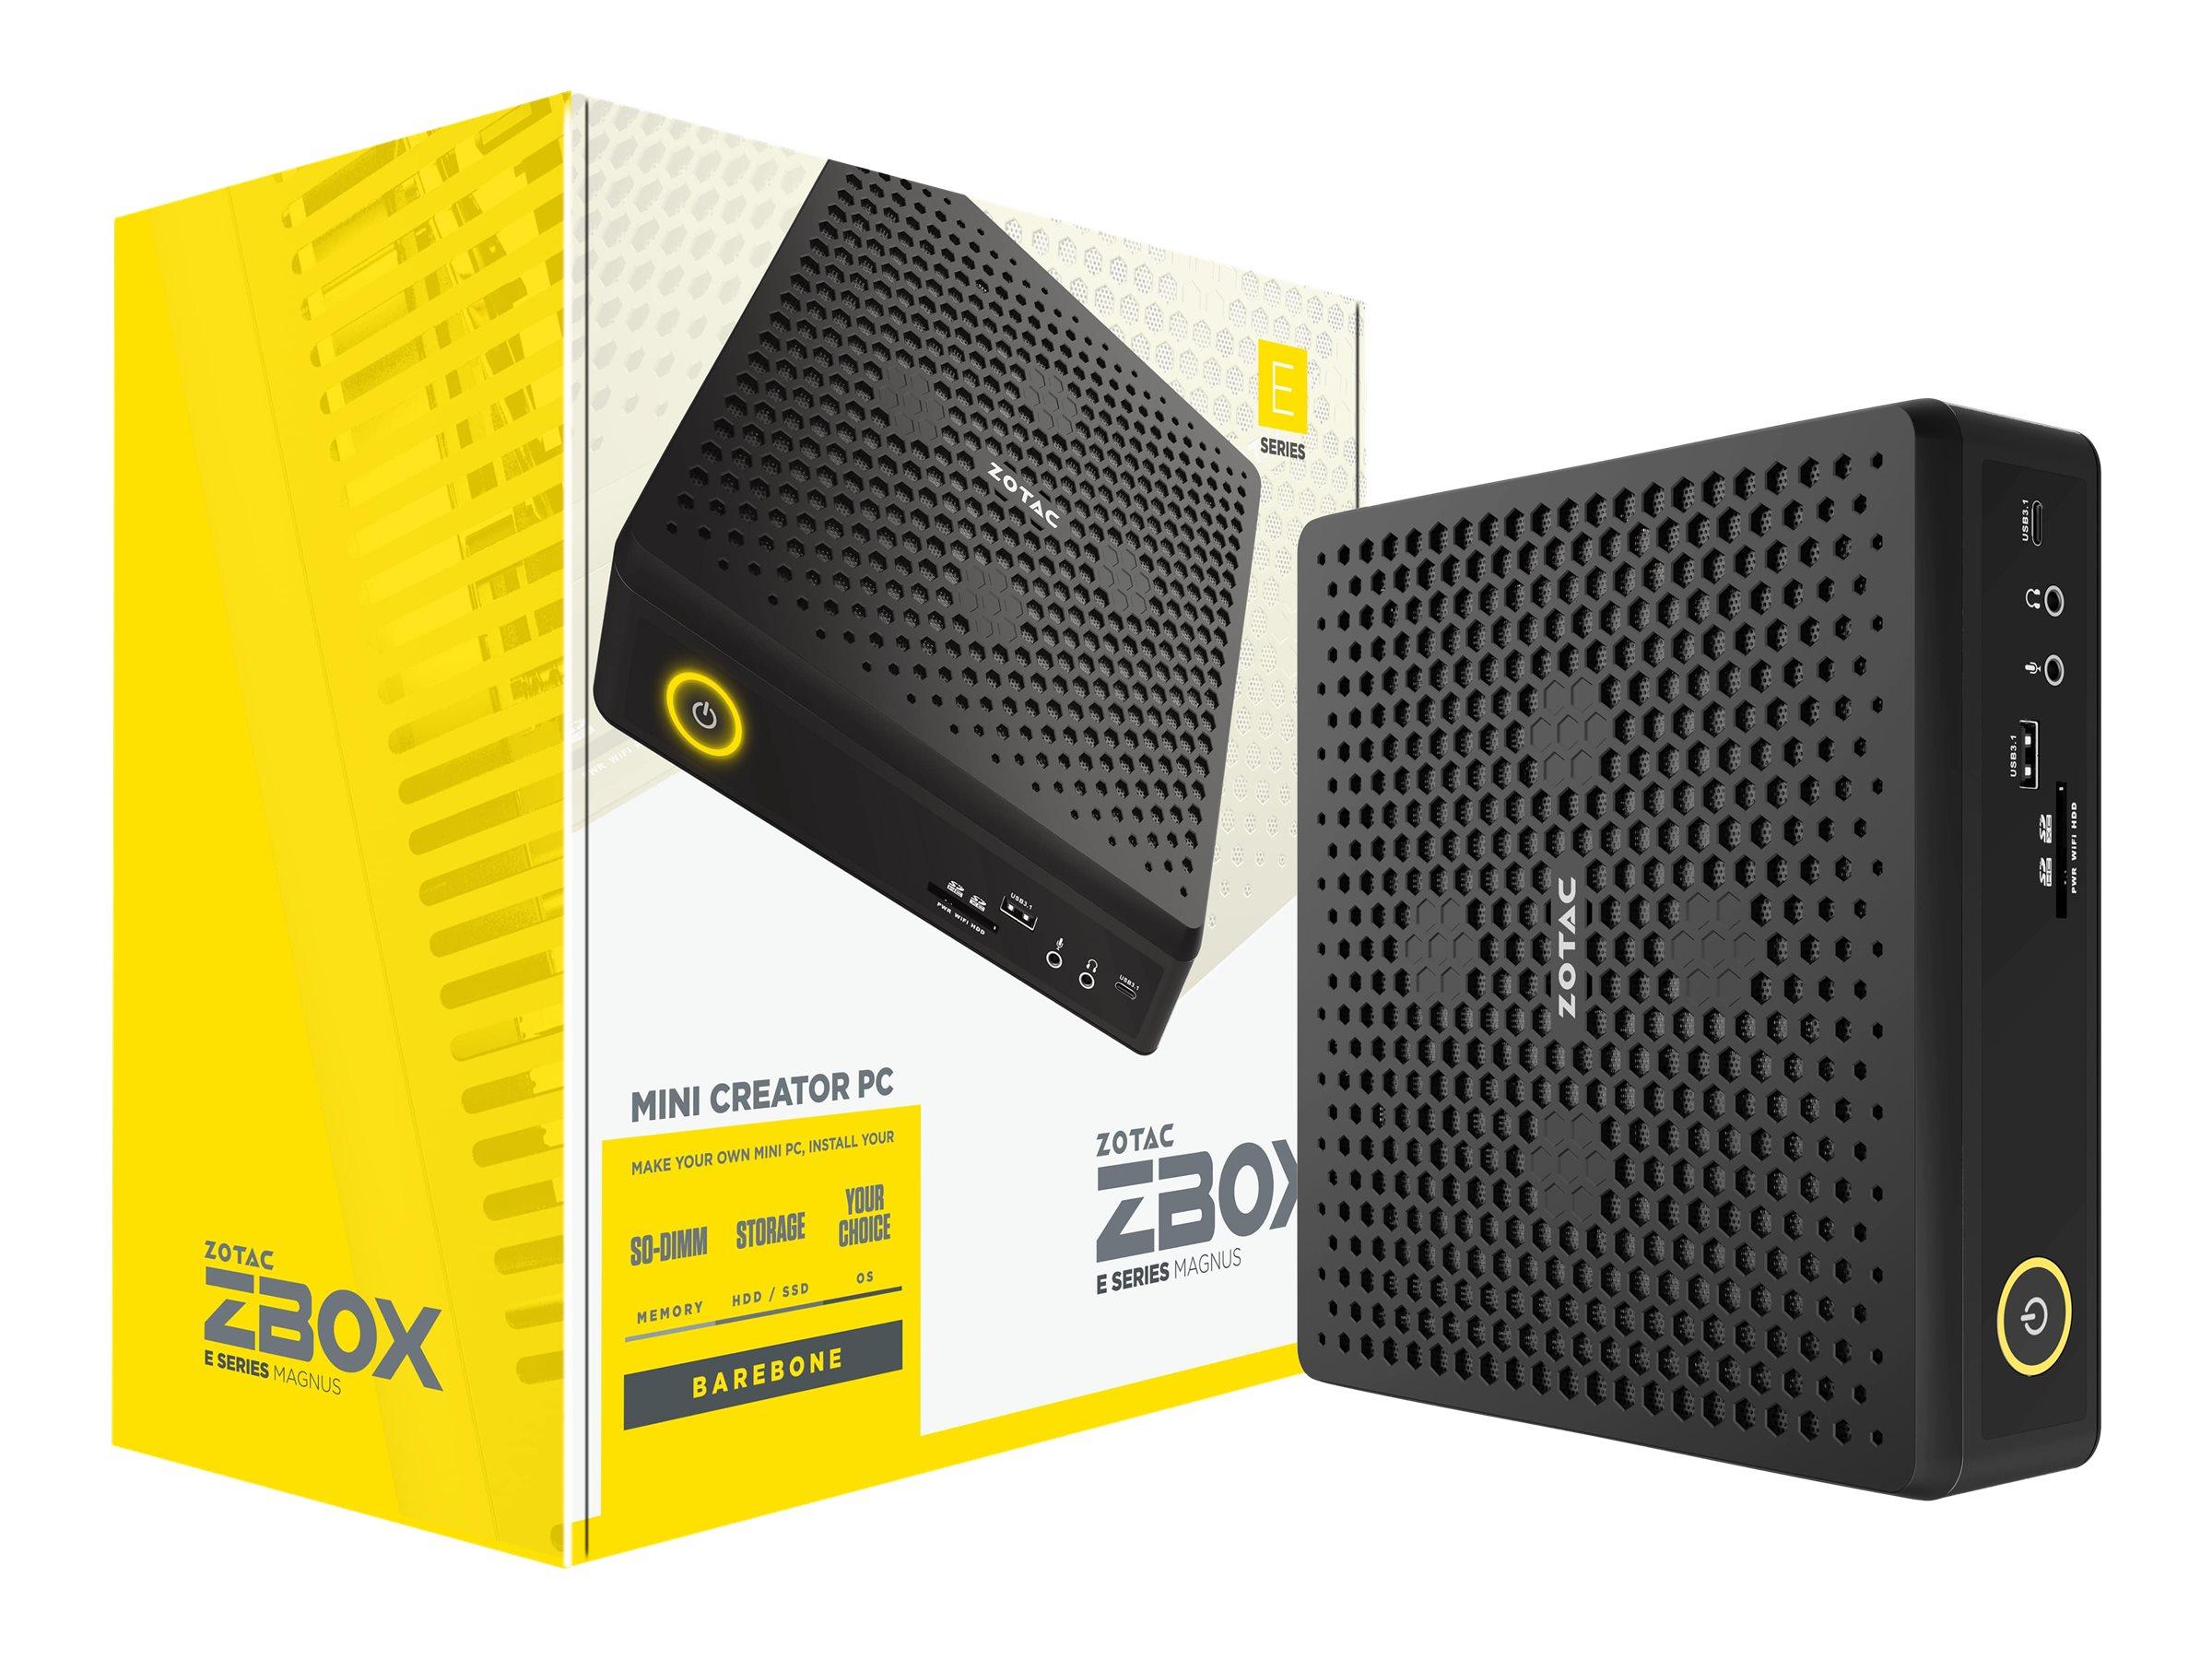 Vorschau: ZOTAC ZBOX E Series MAGNUS EN072080S - Barebone